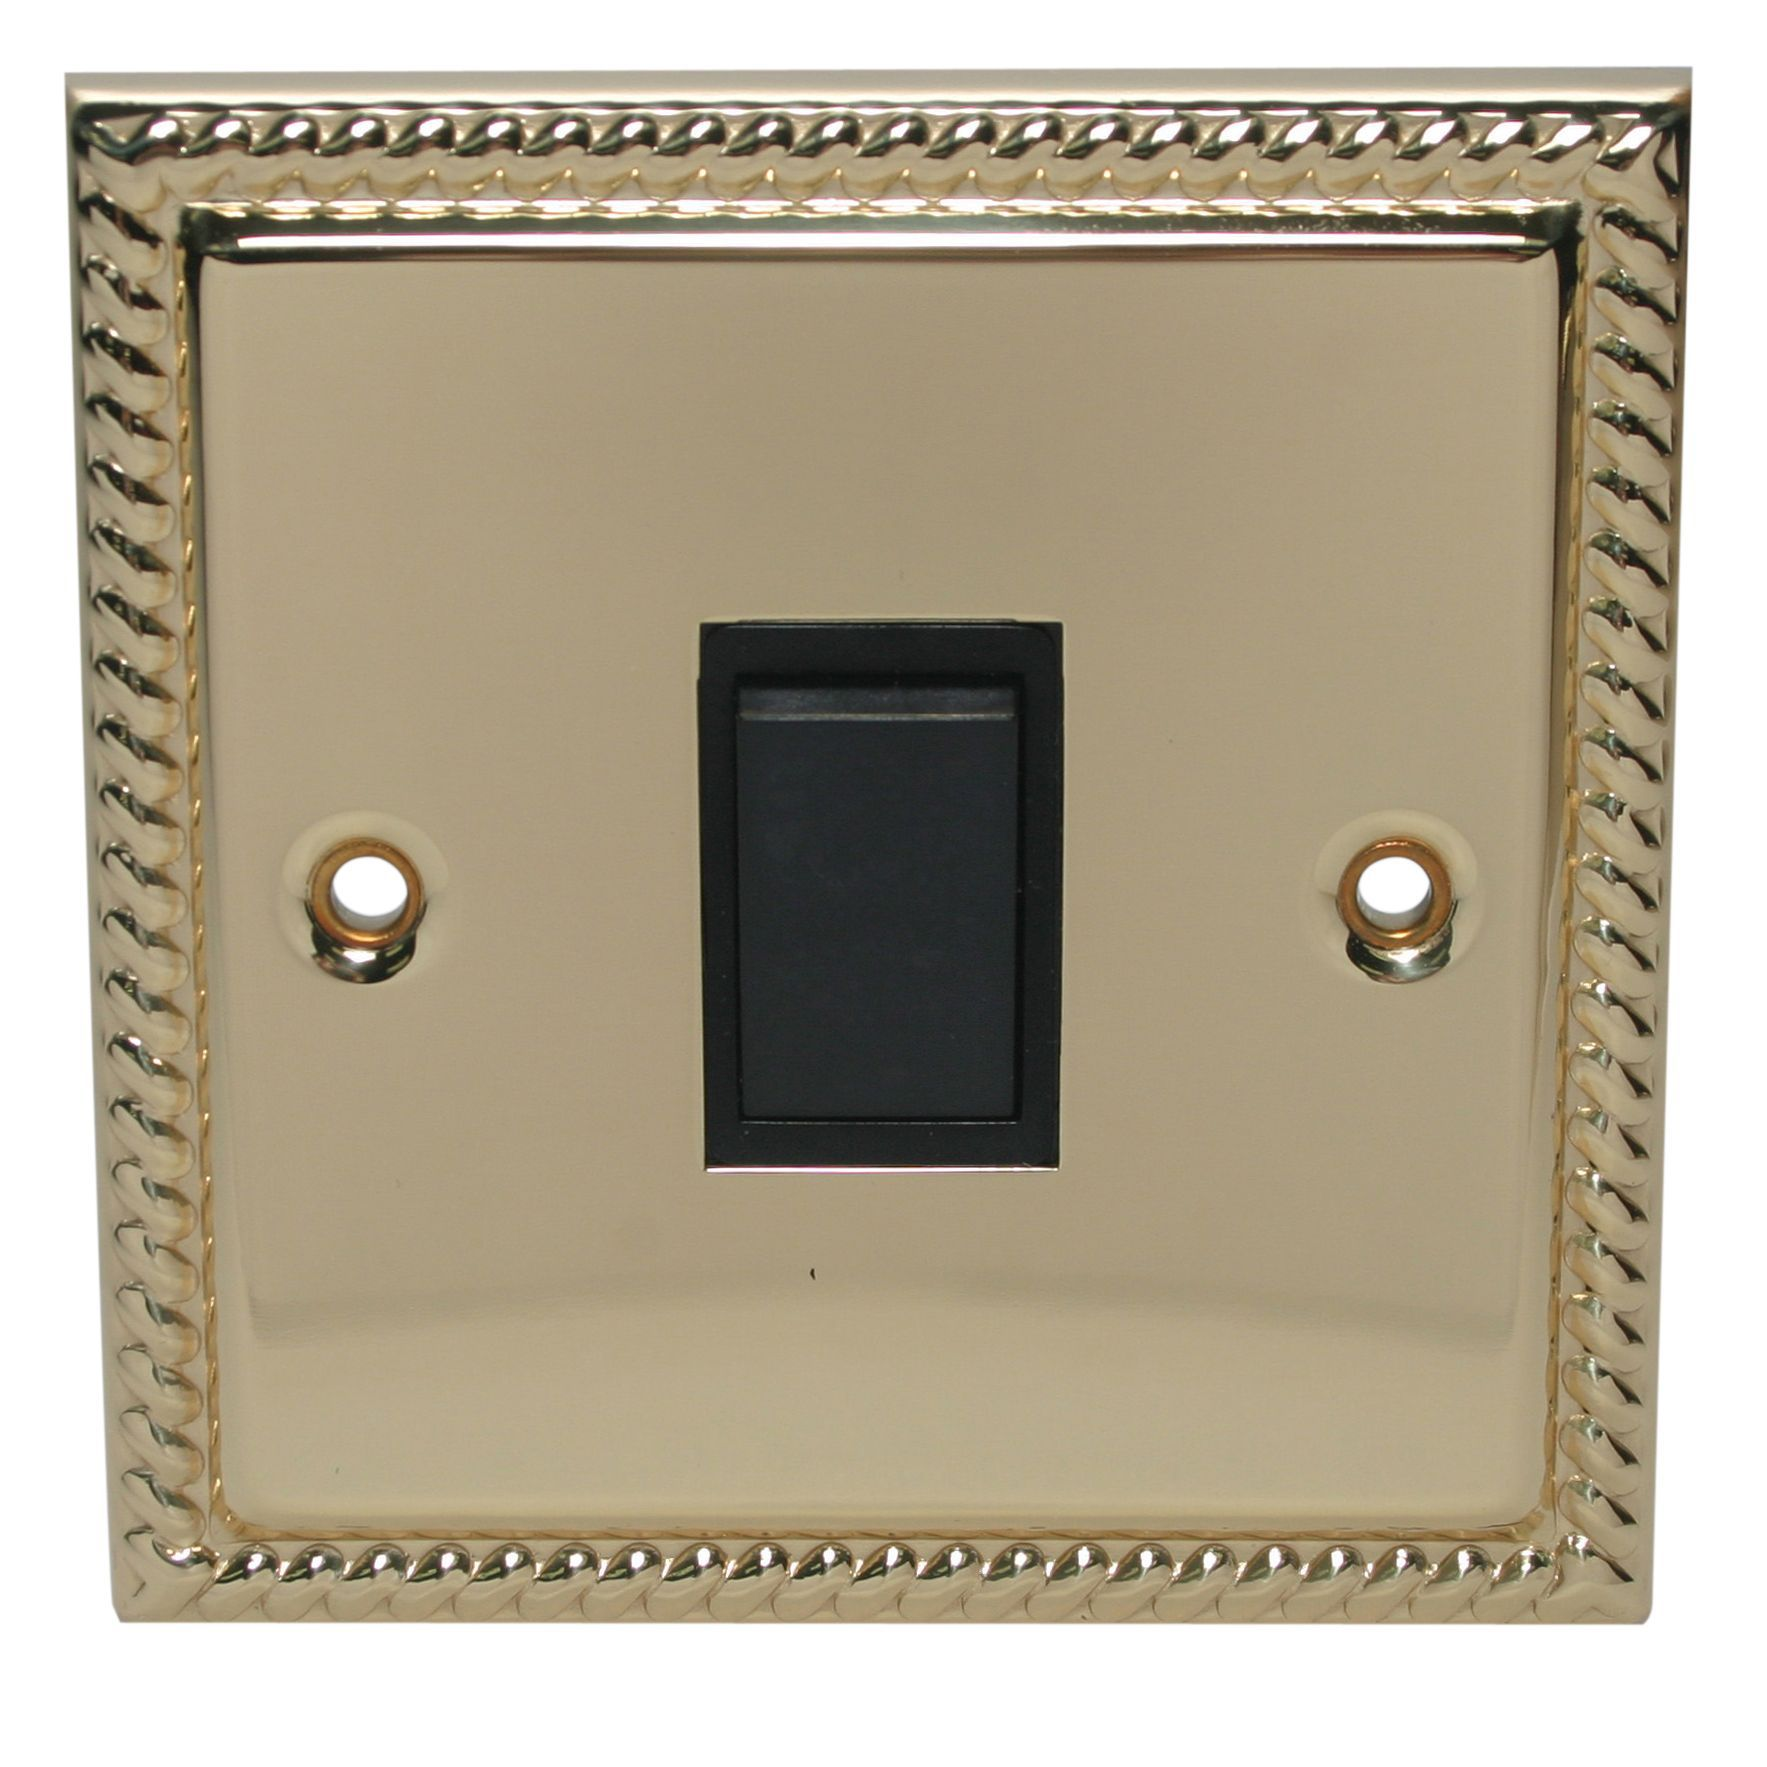 Holder 10a 2-way Single Polished Brass & Gold Effect Intermediate Switch